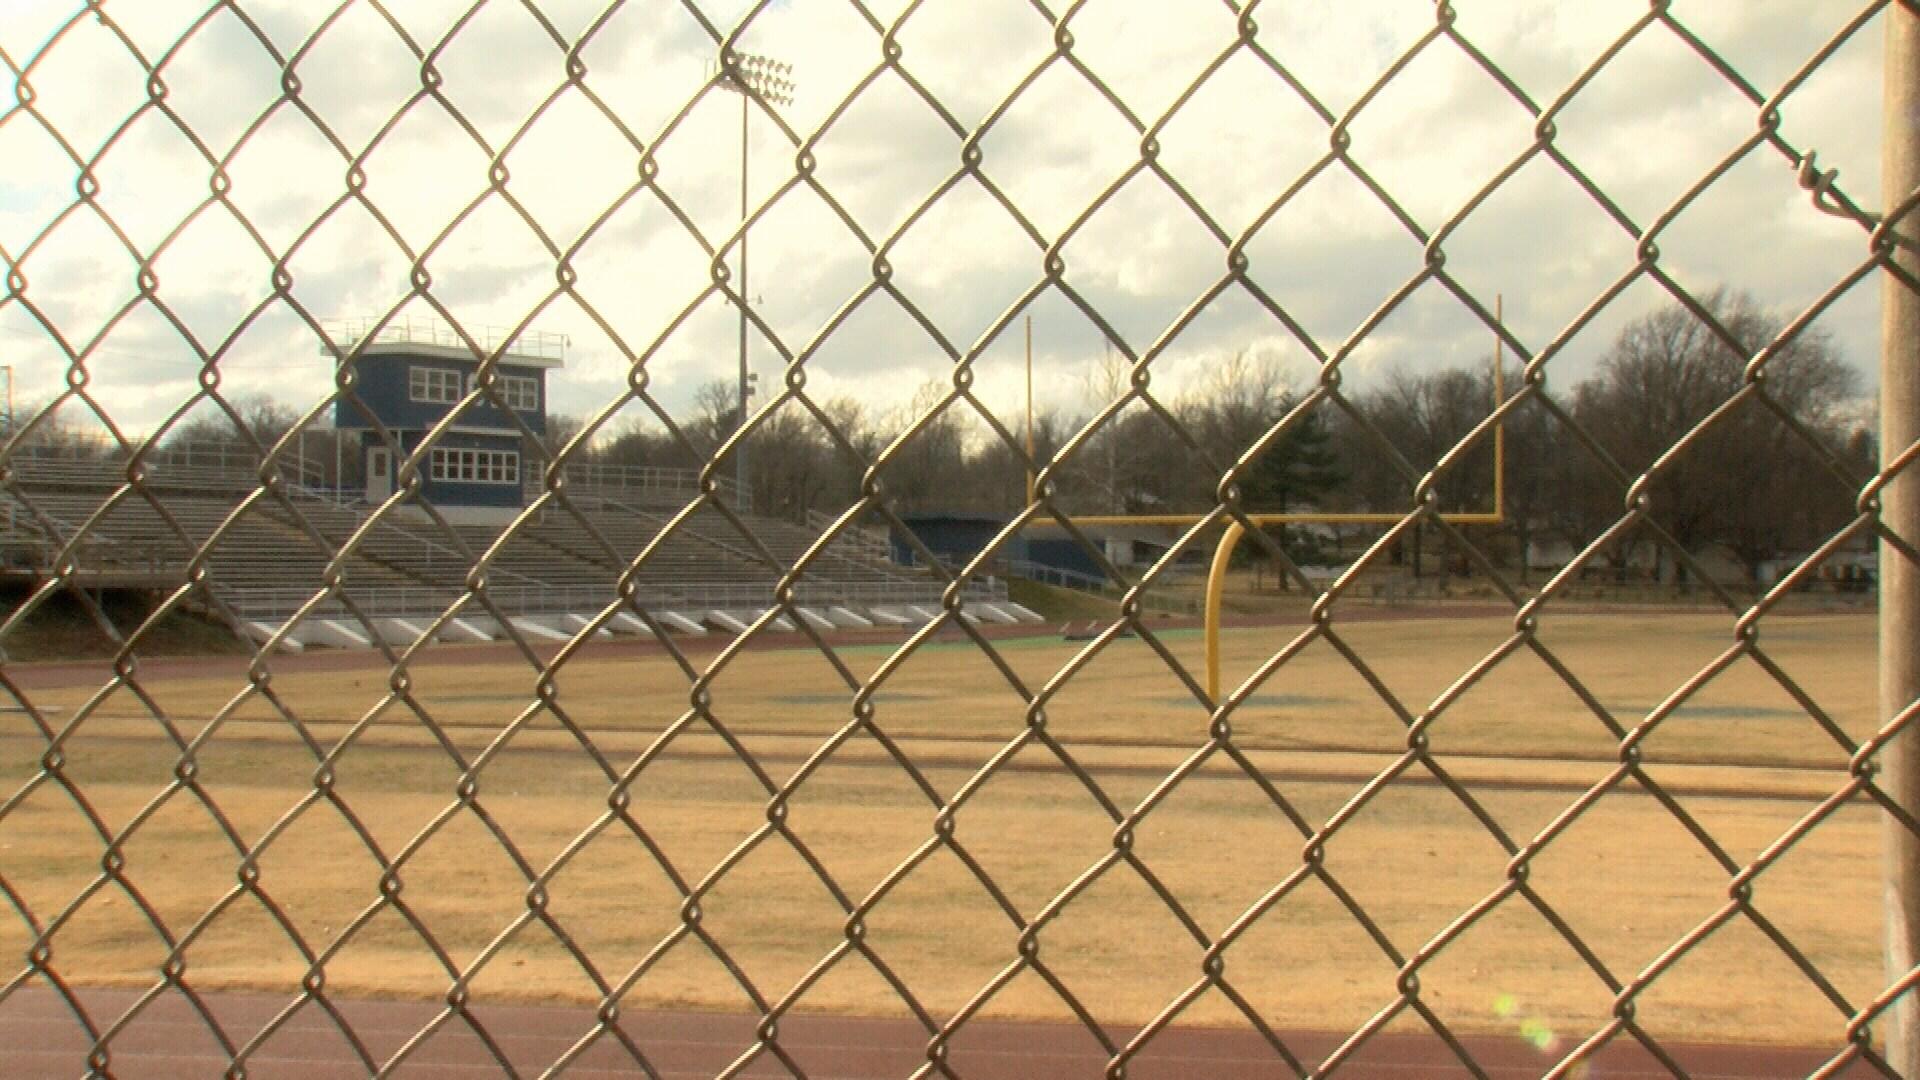 Current football field